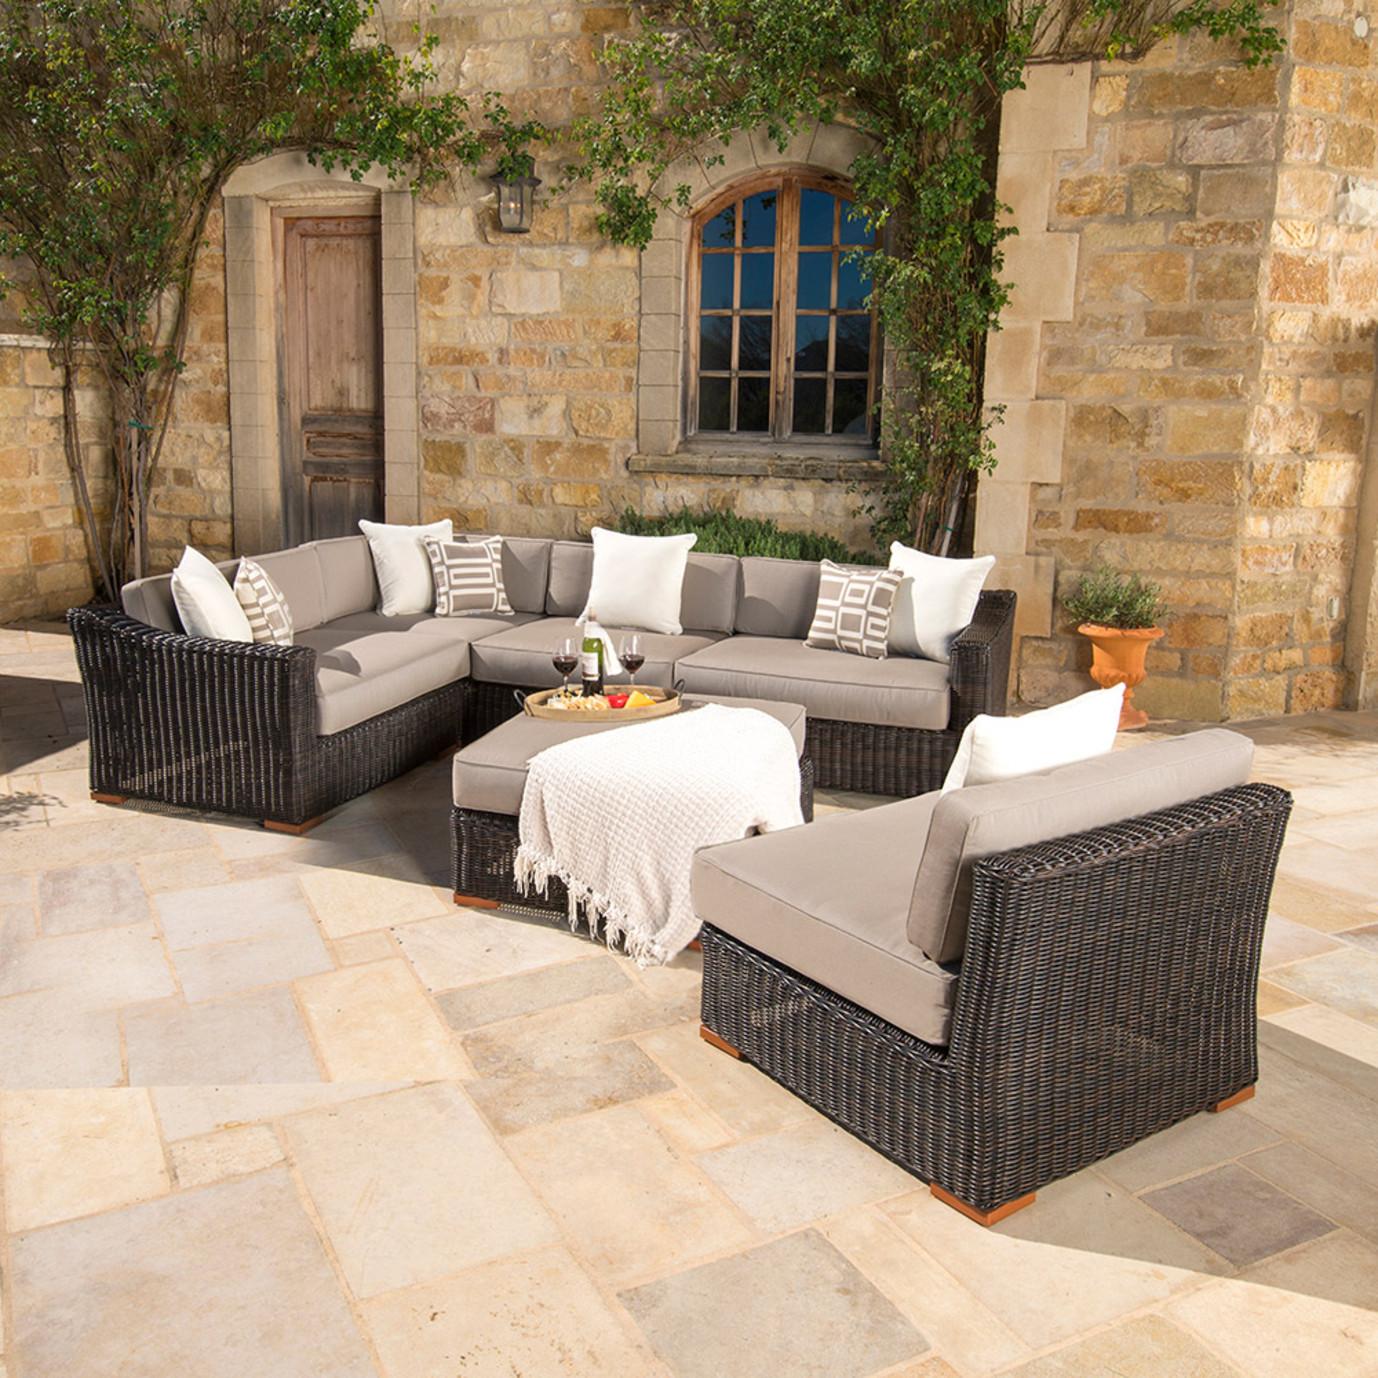 Resort™ 6pc Seating Set with Ottoman – Espresso/Frank Stone